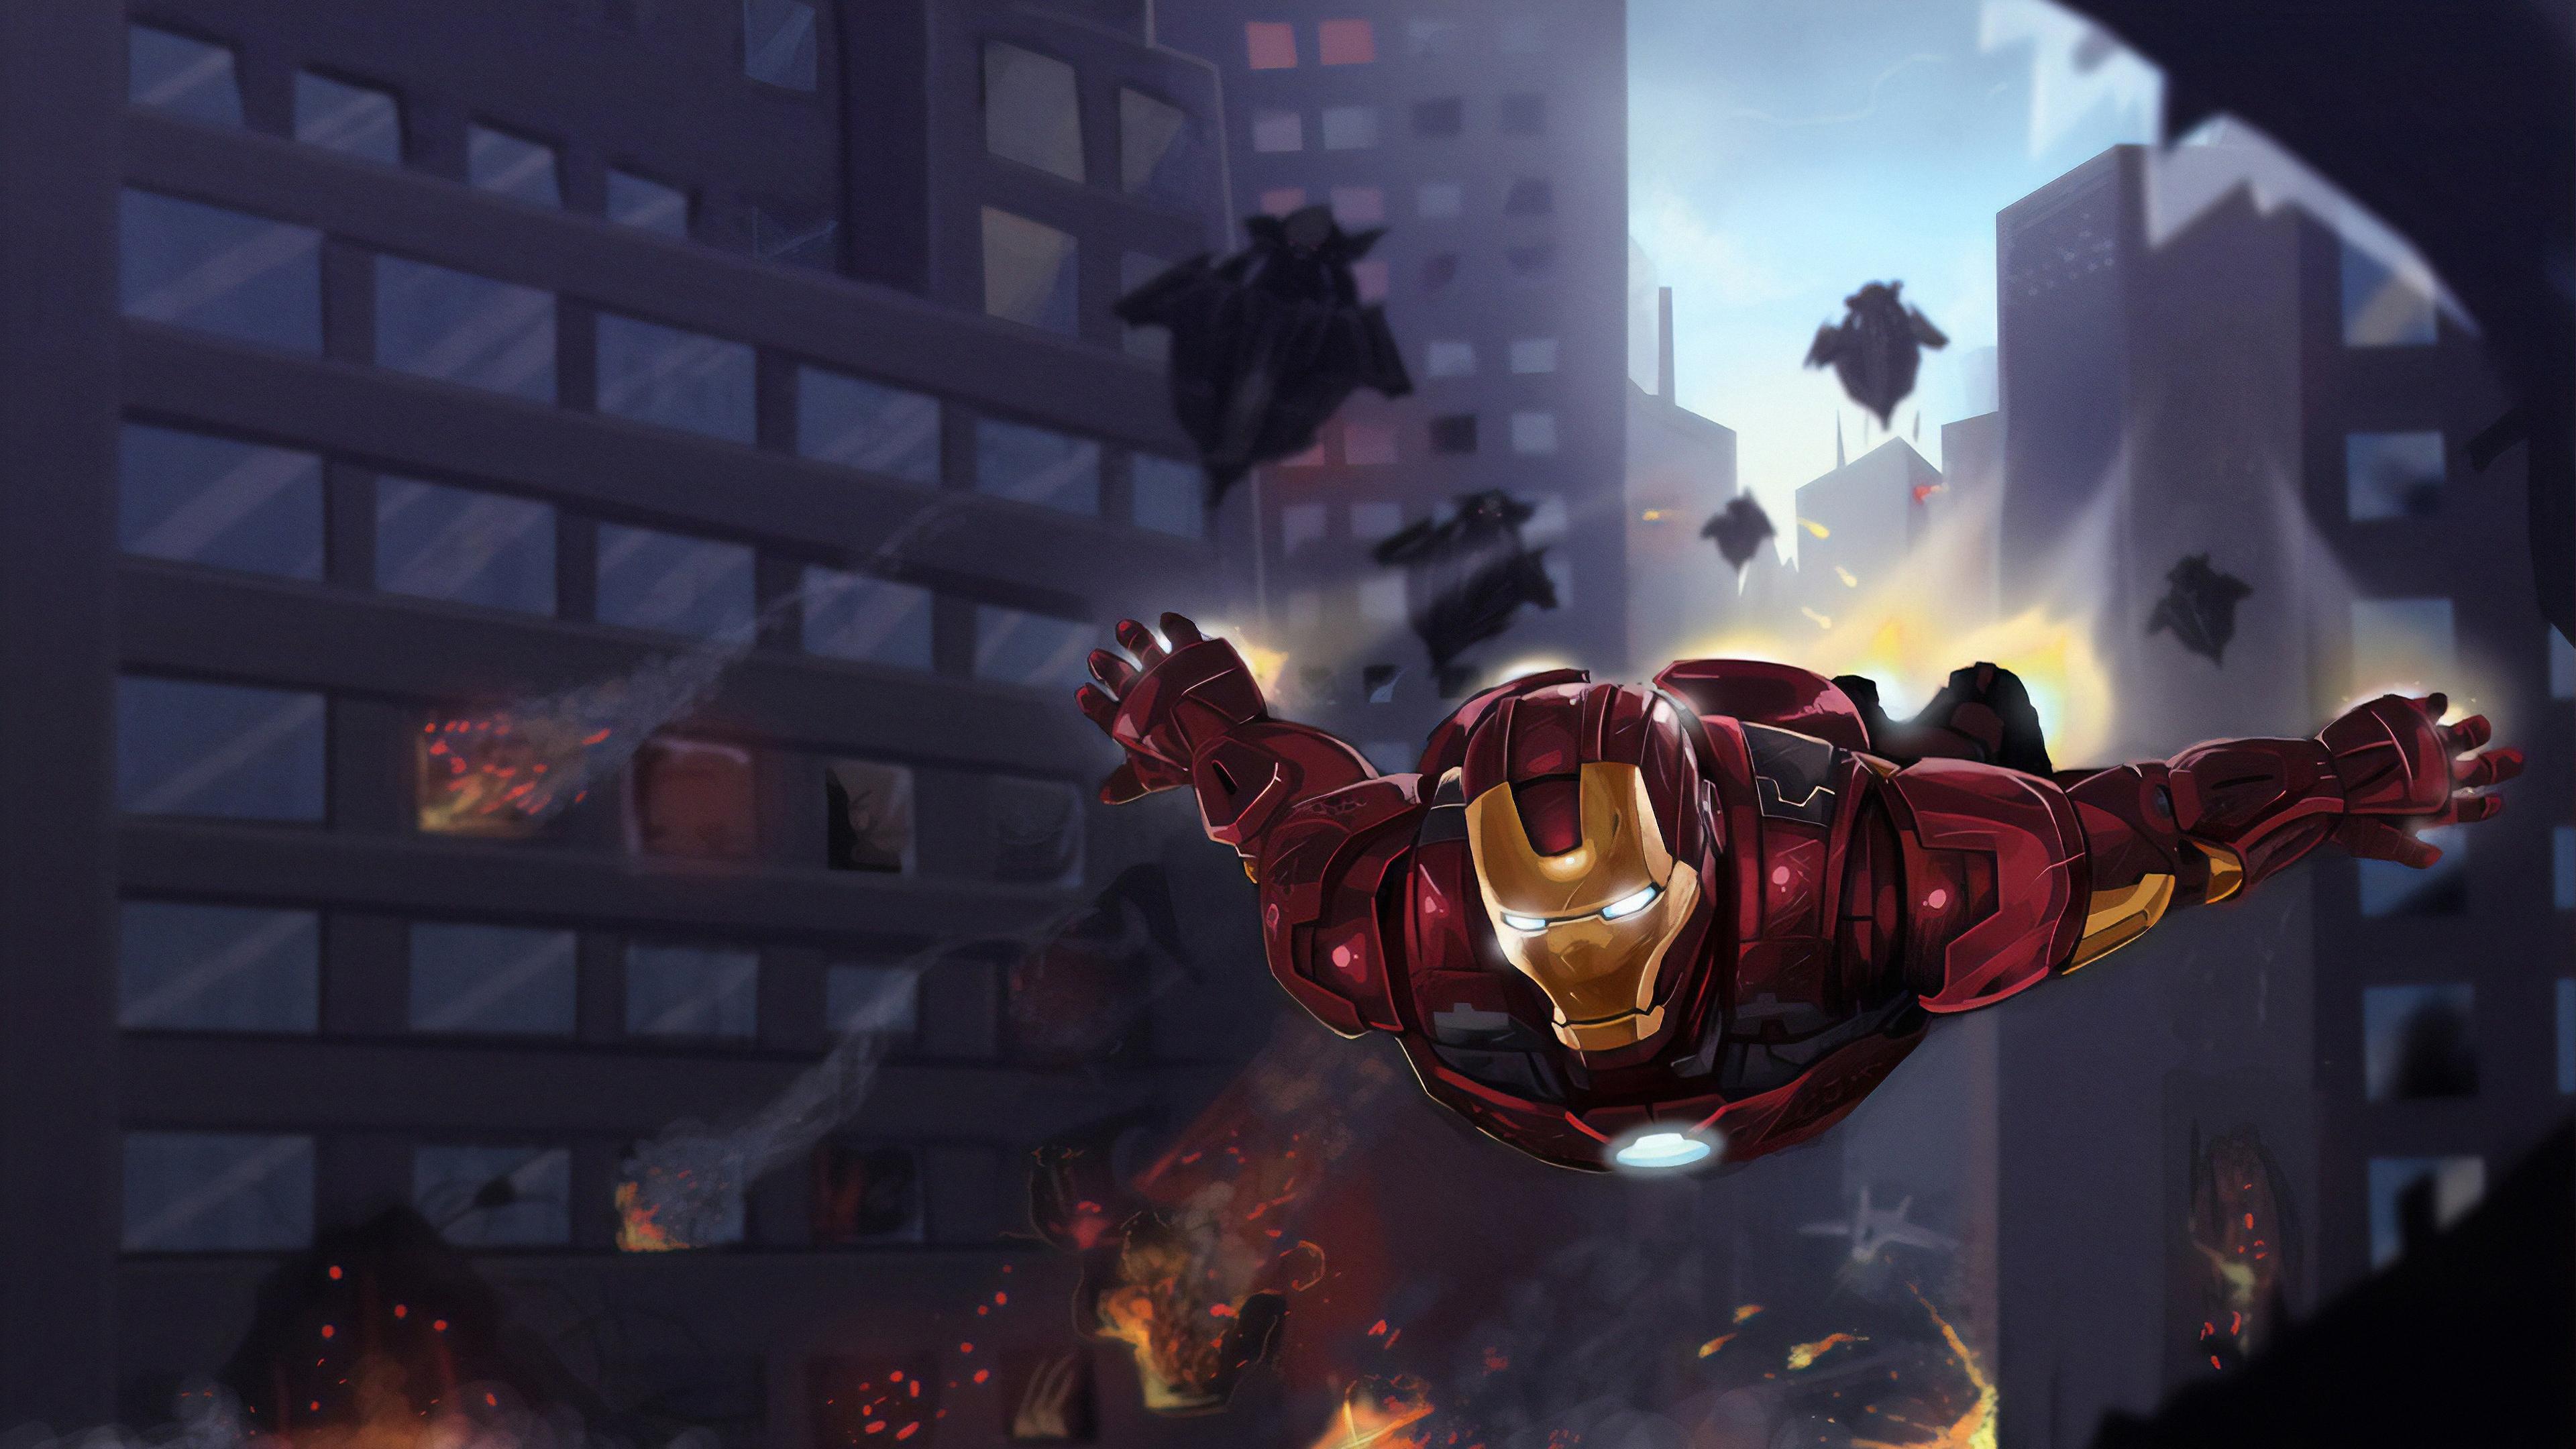 iron man coming 1570394366 - Iron Man Coming - superheroes wallpapers, iron man wallpapers, hd-wallpapers, digital art wallpapers, deviantart wallpapers, artwork wallpapers, 4k-wallpapers